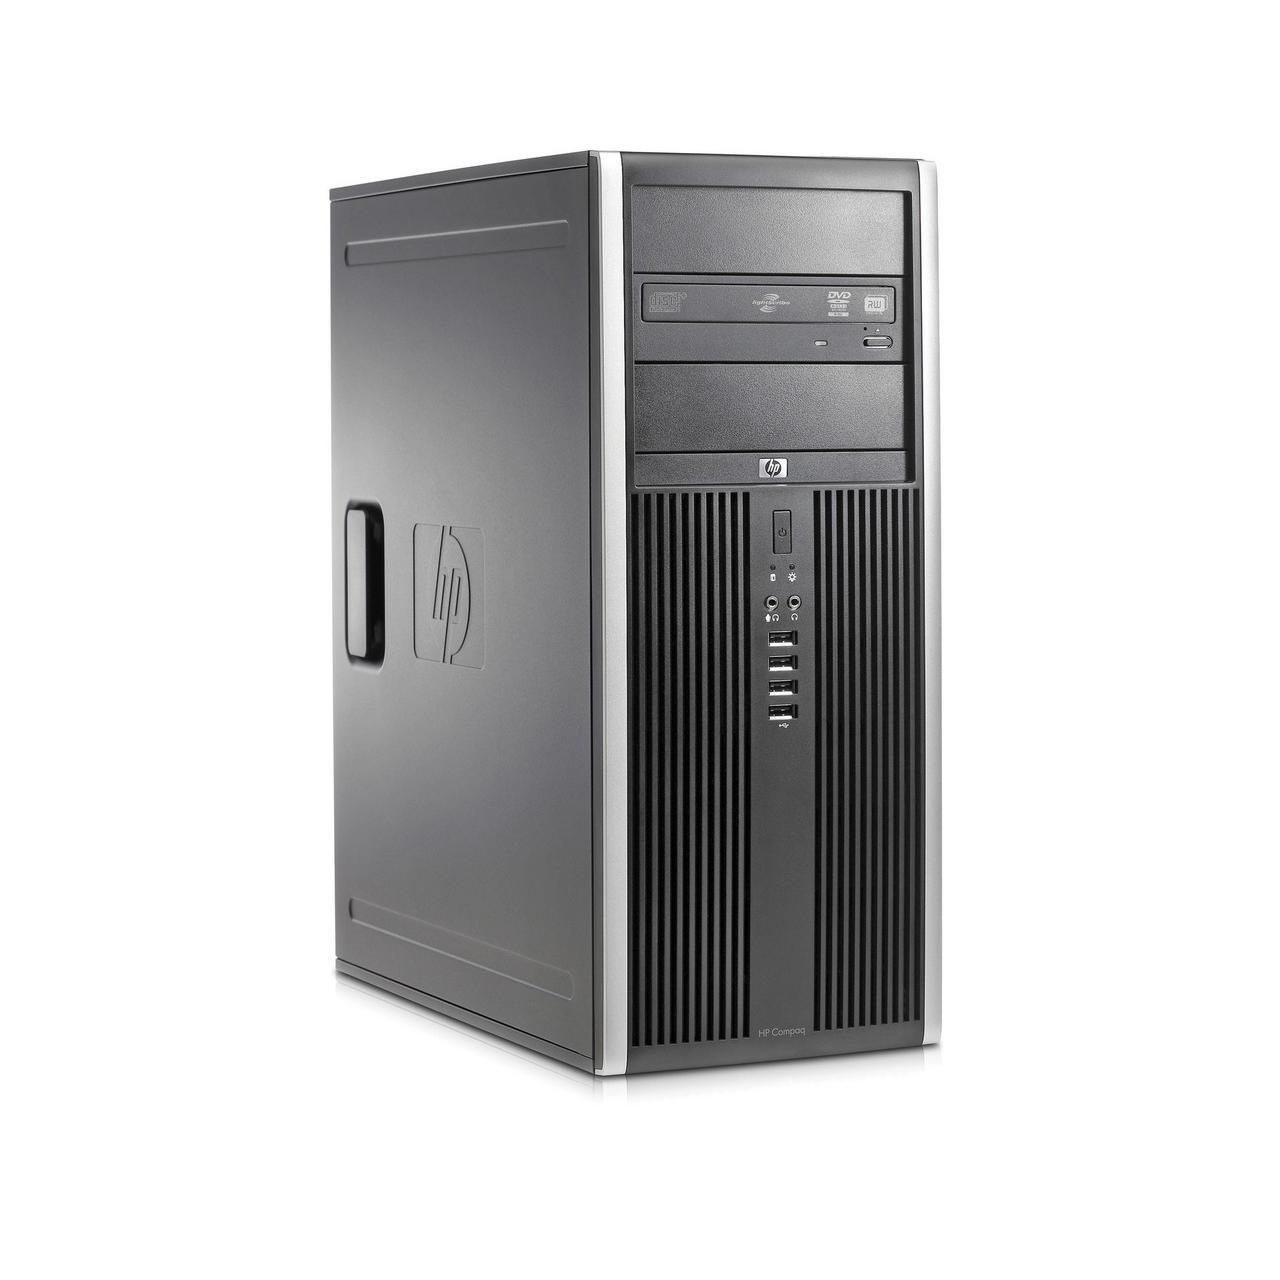 "Hp ELITE 8200 MT 22"" Core i3-2120 3,3 GHz - HDD 2 TB - 4GB"